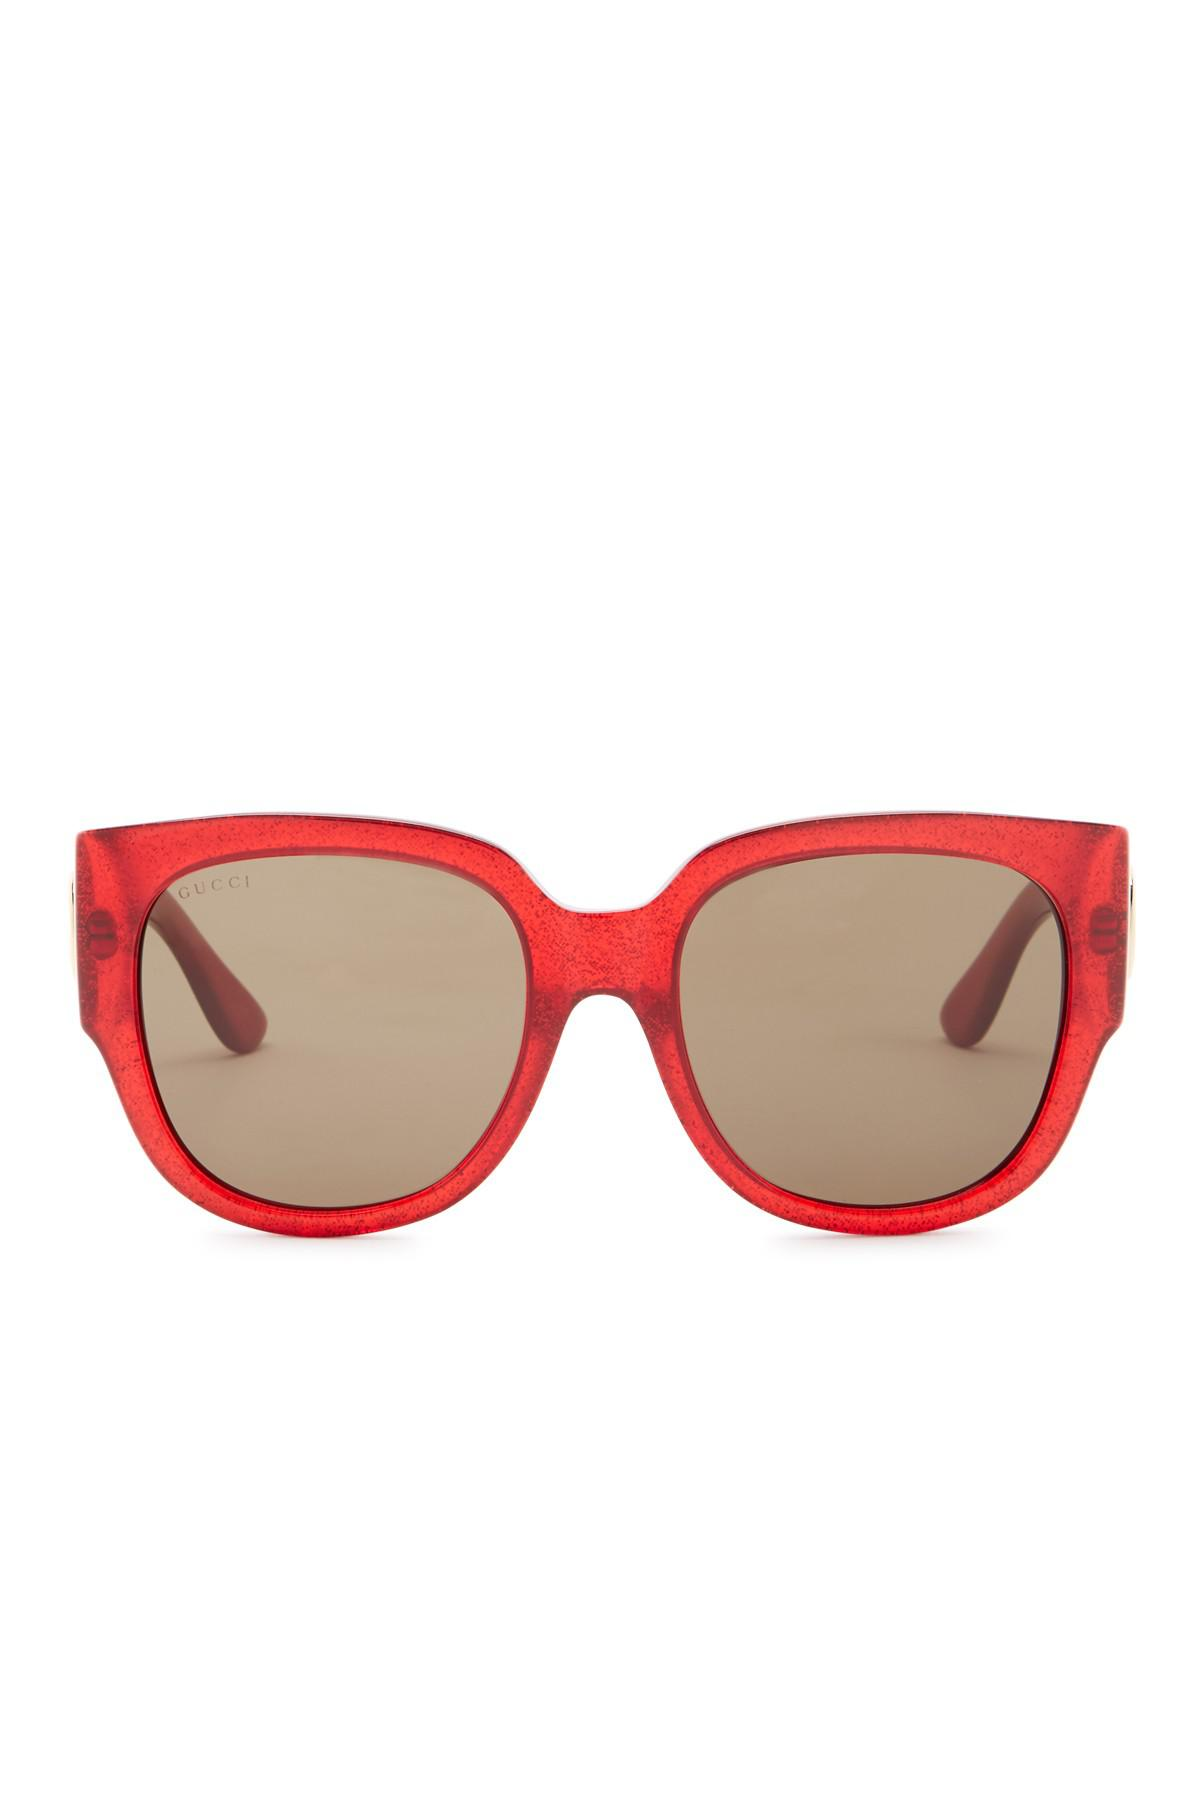 f8e3d0d0b43 Lyst - Gucci 55mm Glitter Square Sunglasses in Red